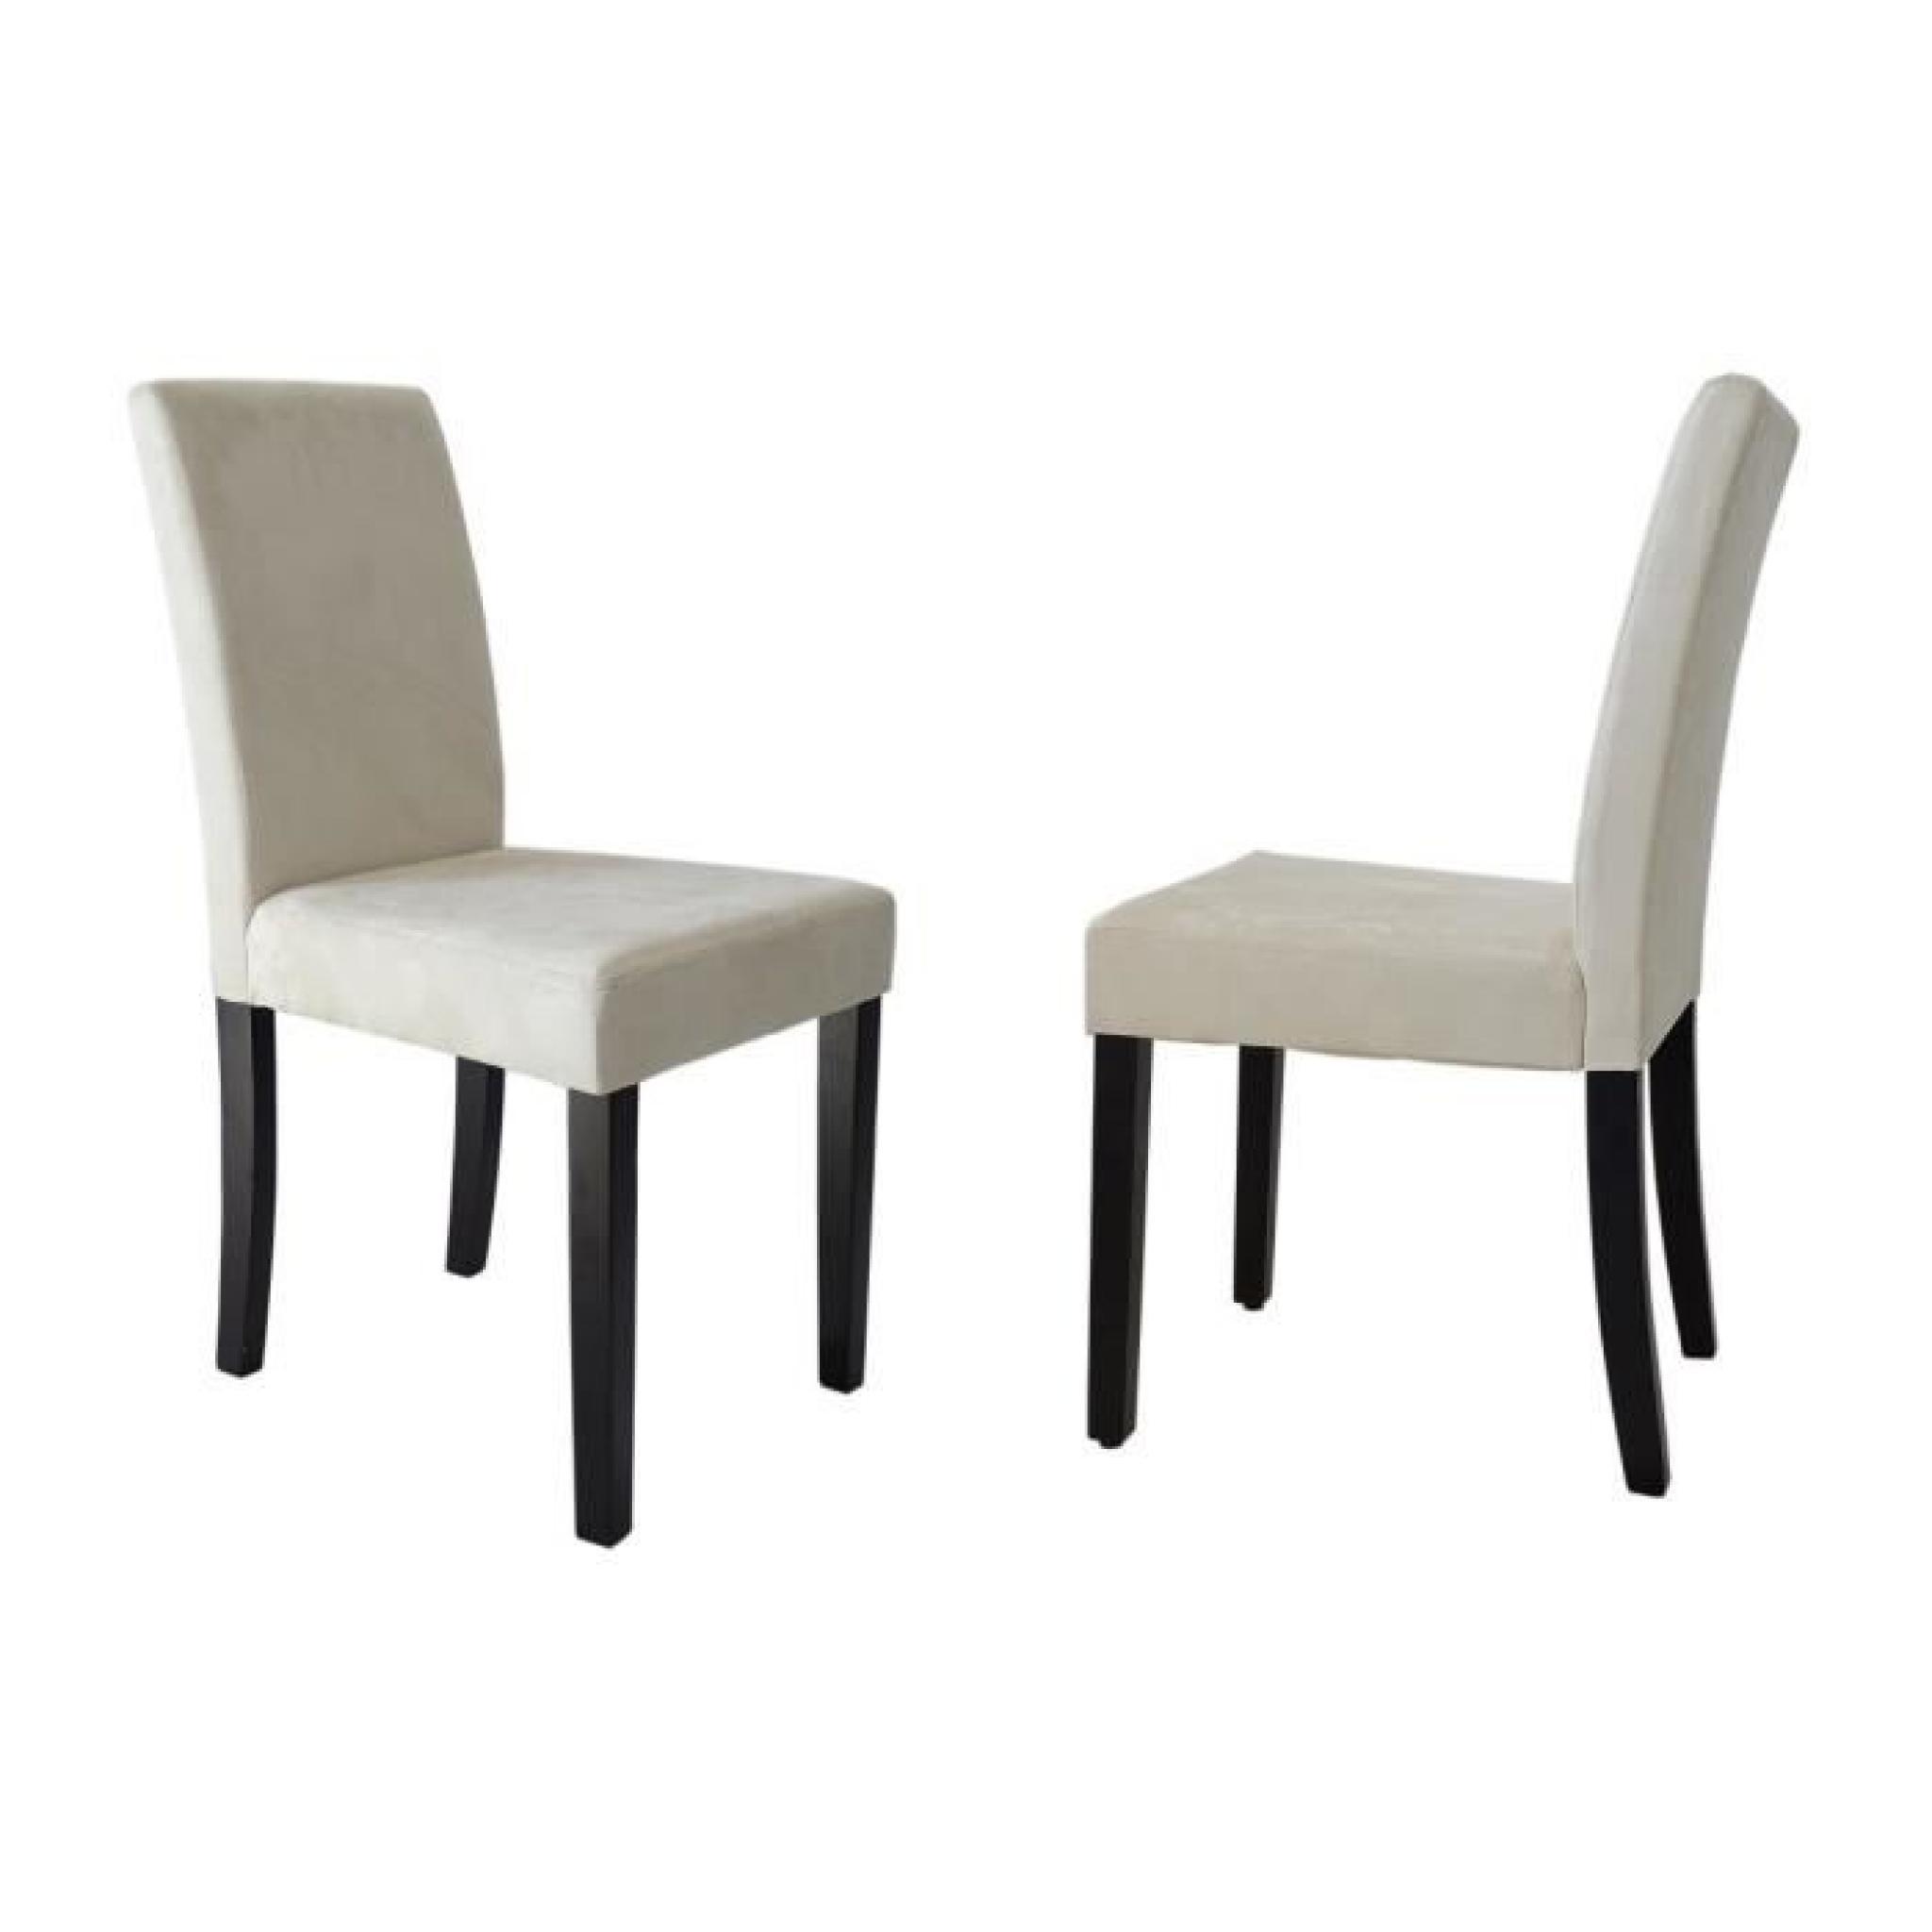 Clara lot de 2 chaises de salle manger en tissu couleur for Chaises salle a manger couleur